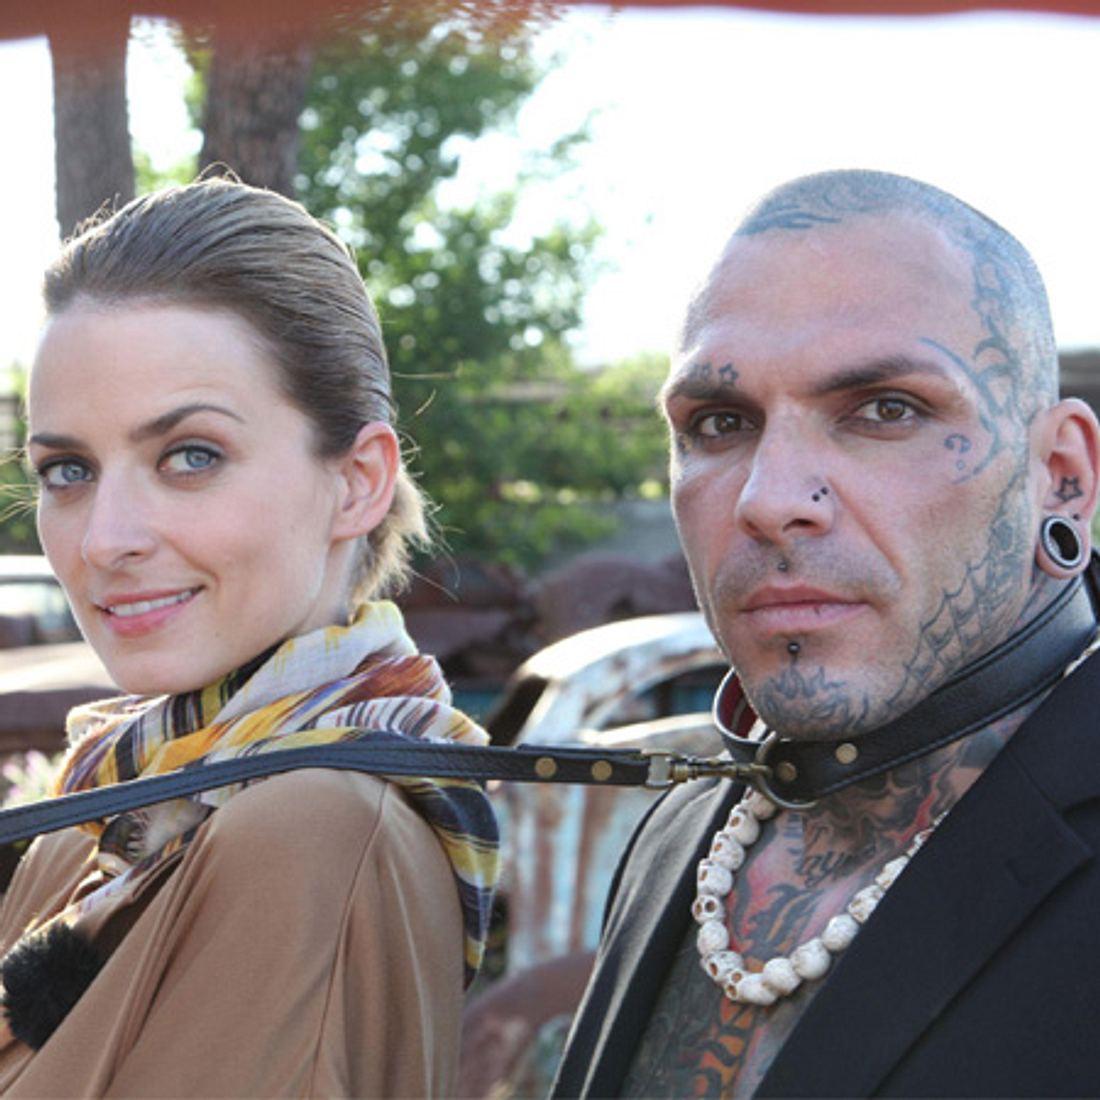 Eva Padberg (32) und Werbedreh-Star Tattitude